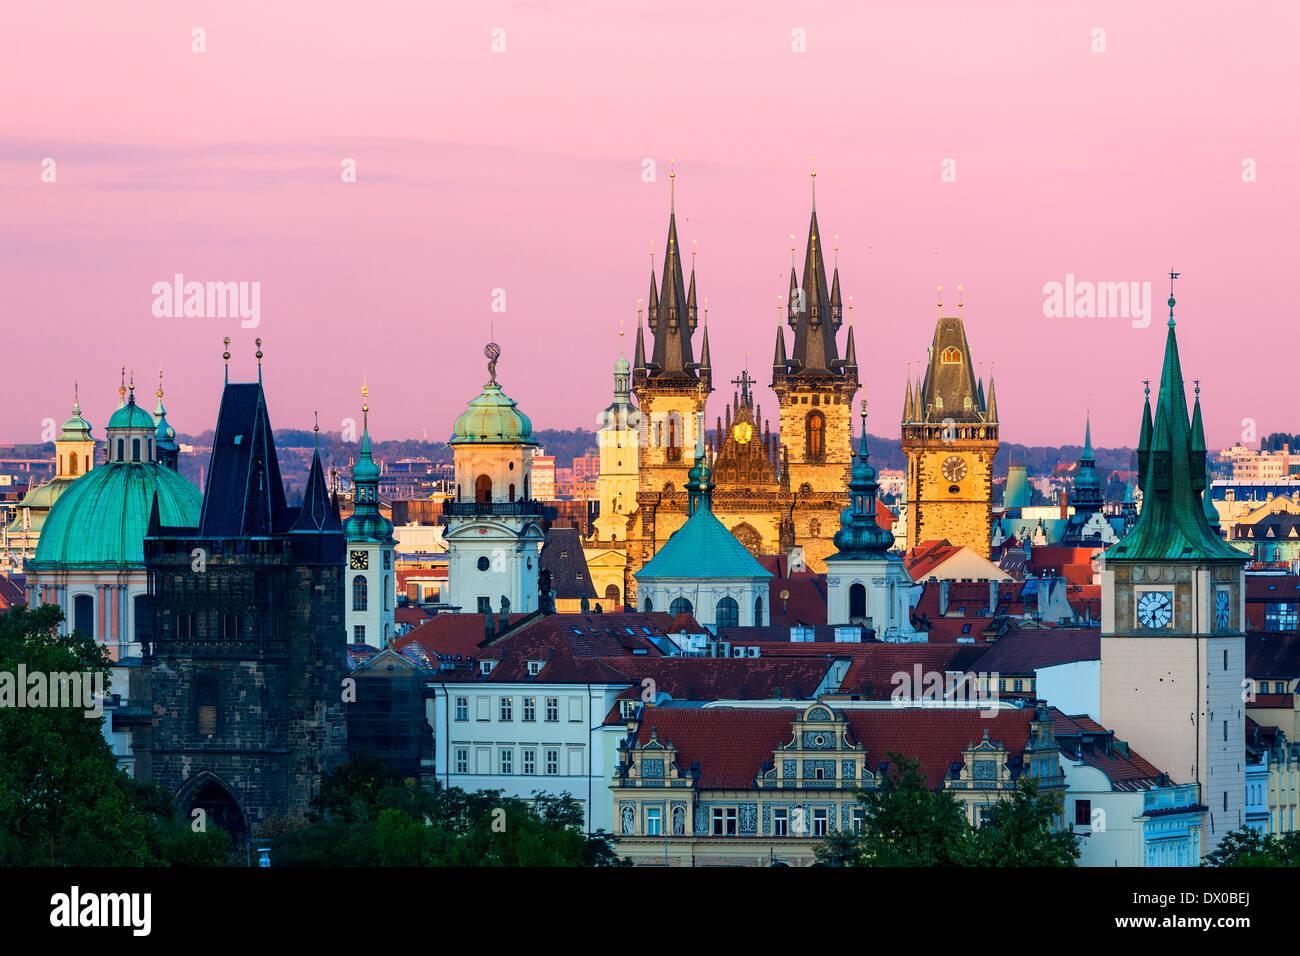 República Checa, horizonte de Praga al anochecer Imagen De Stock